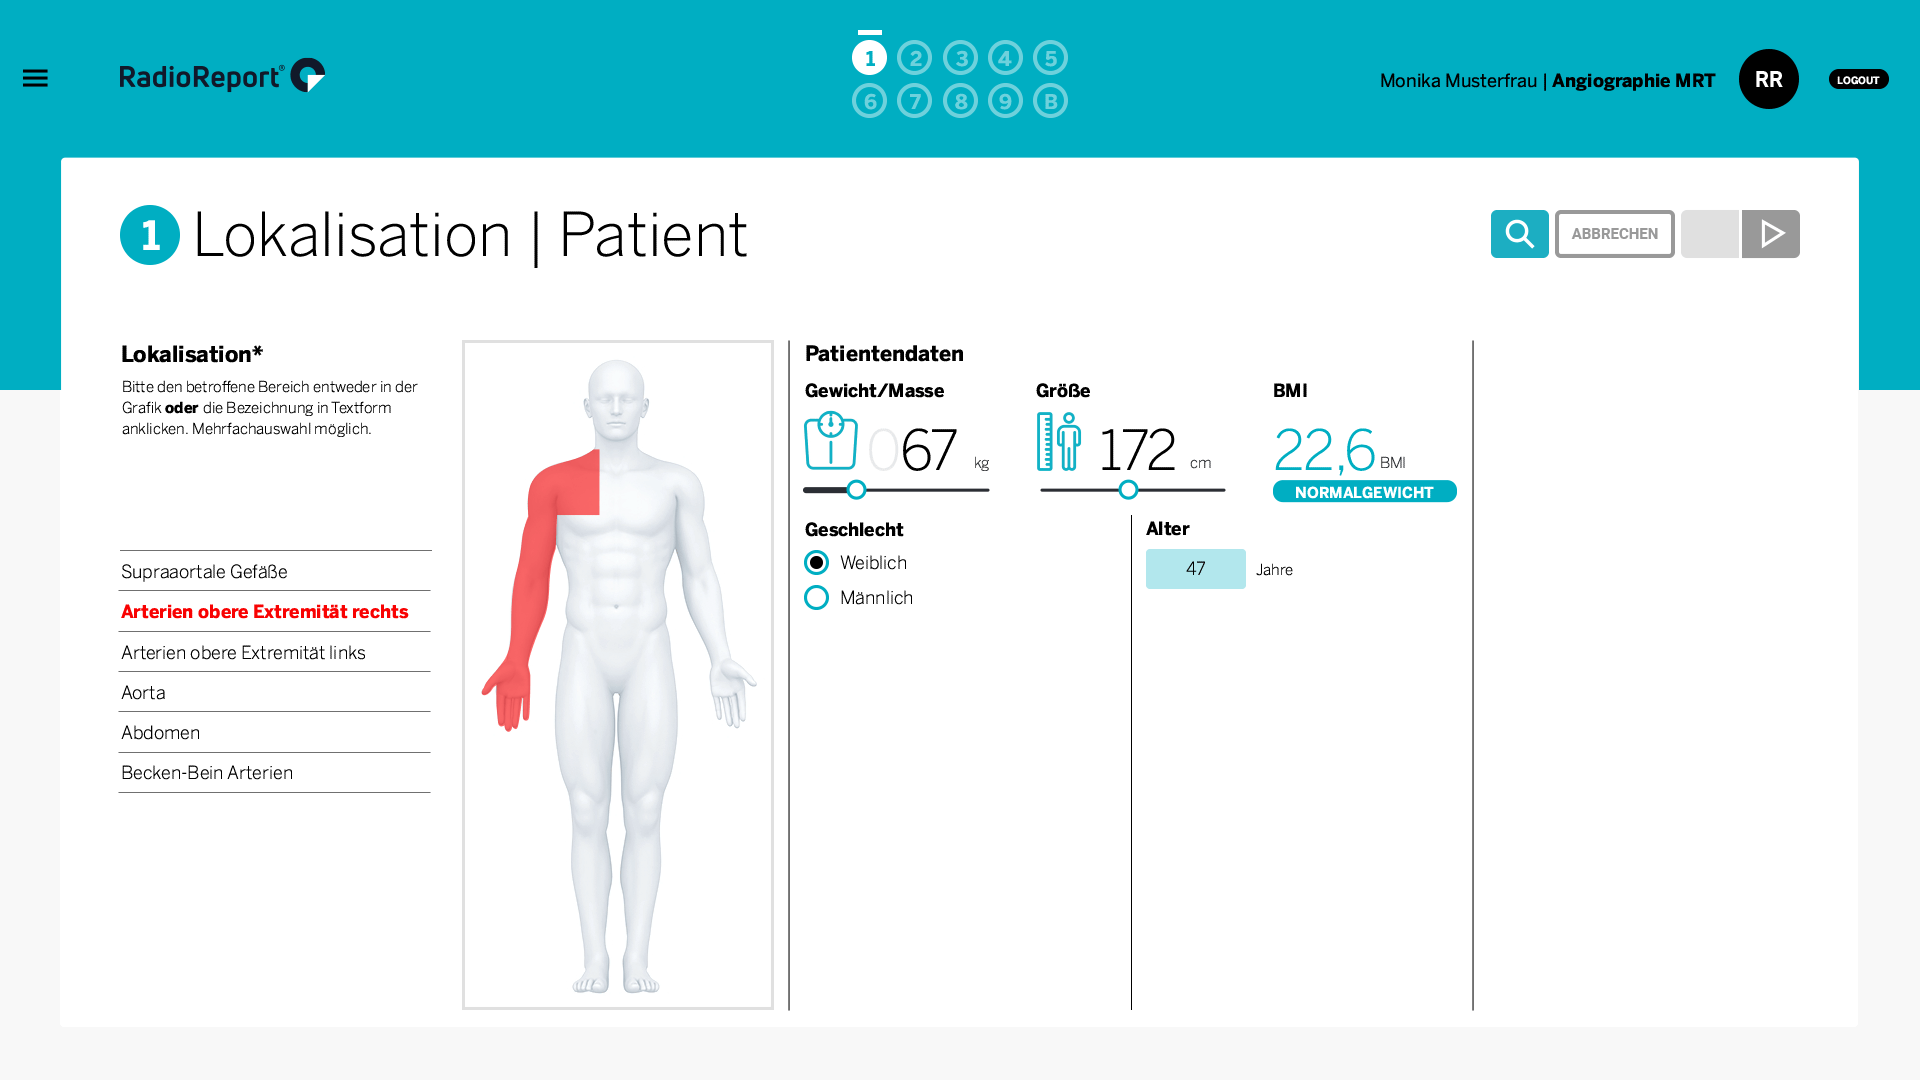 RadioReport Angiographie MRT